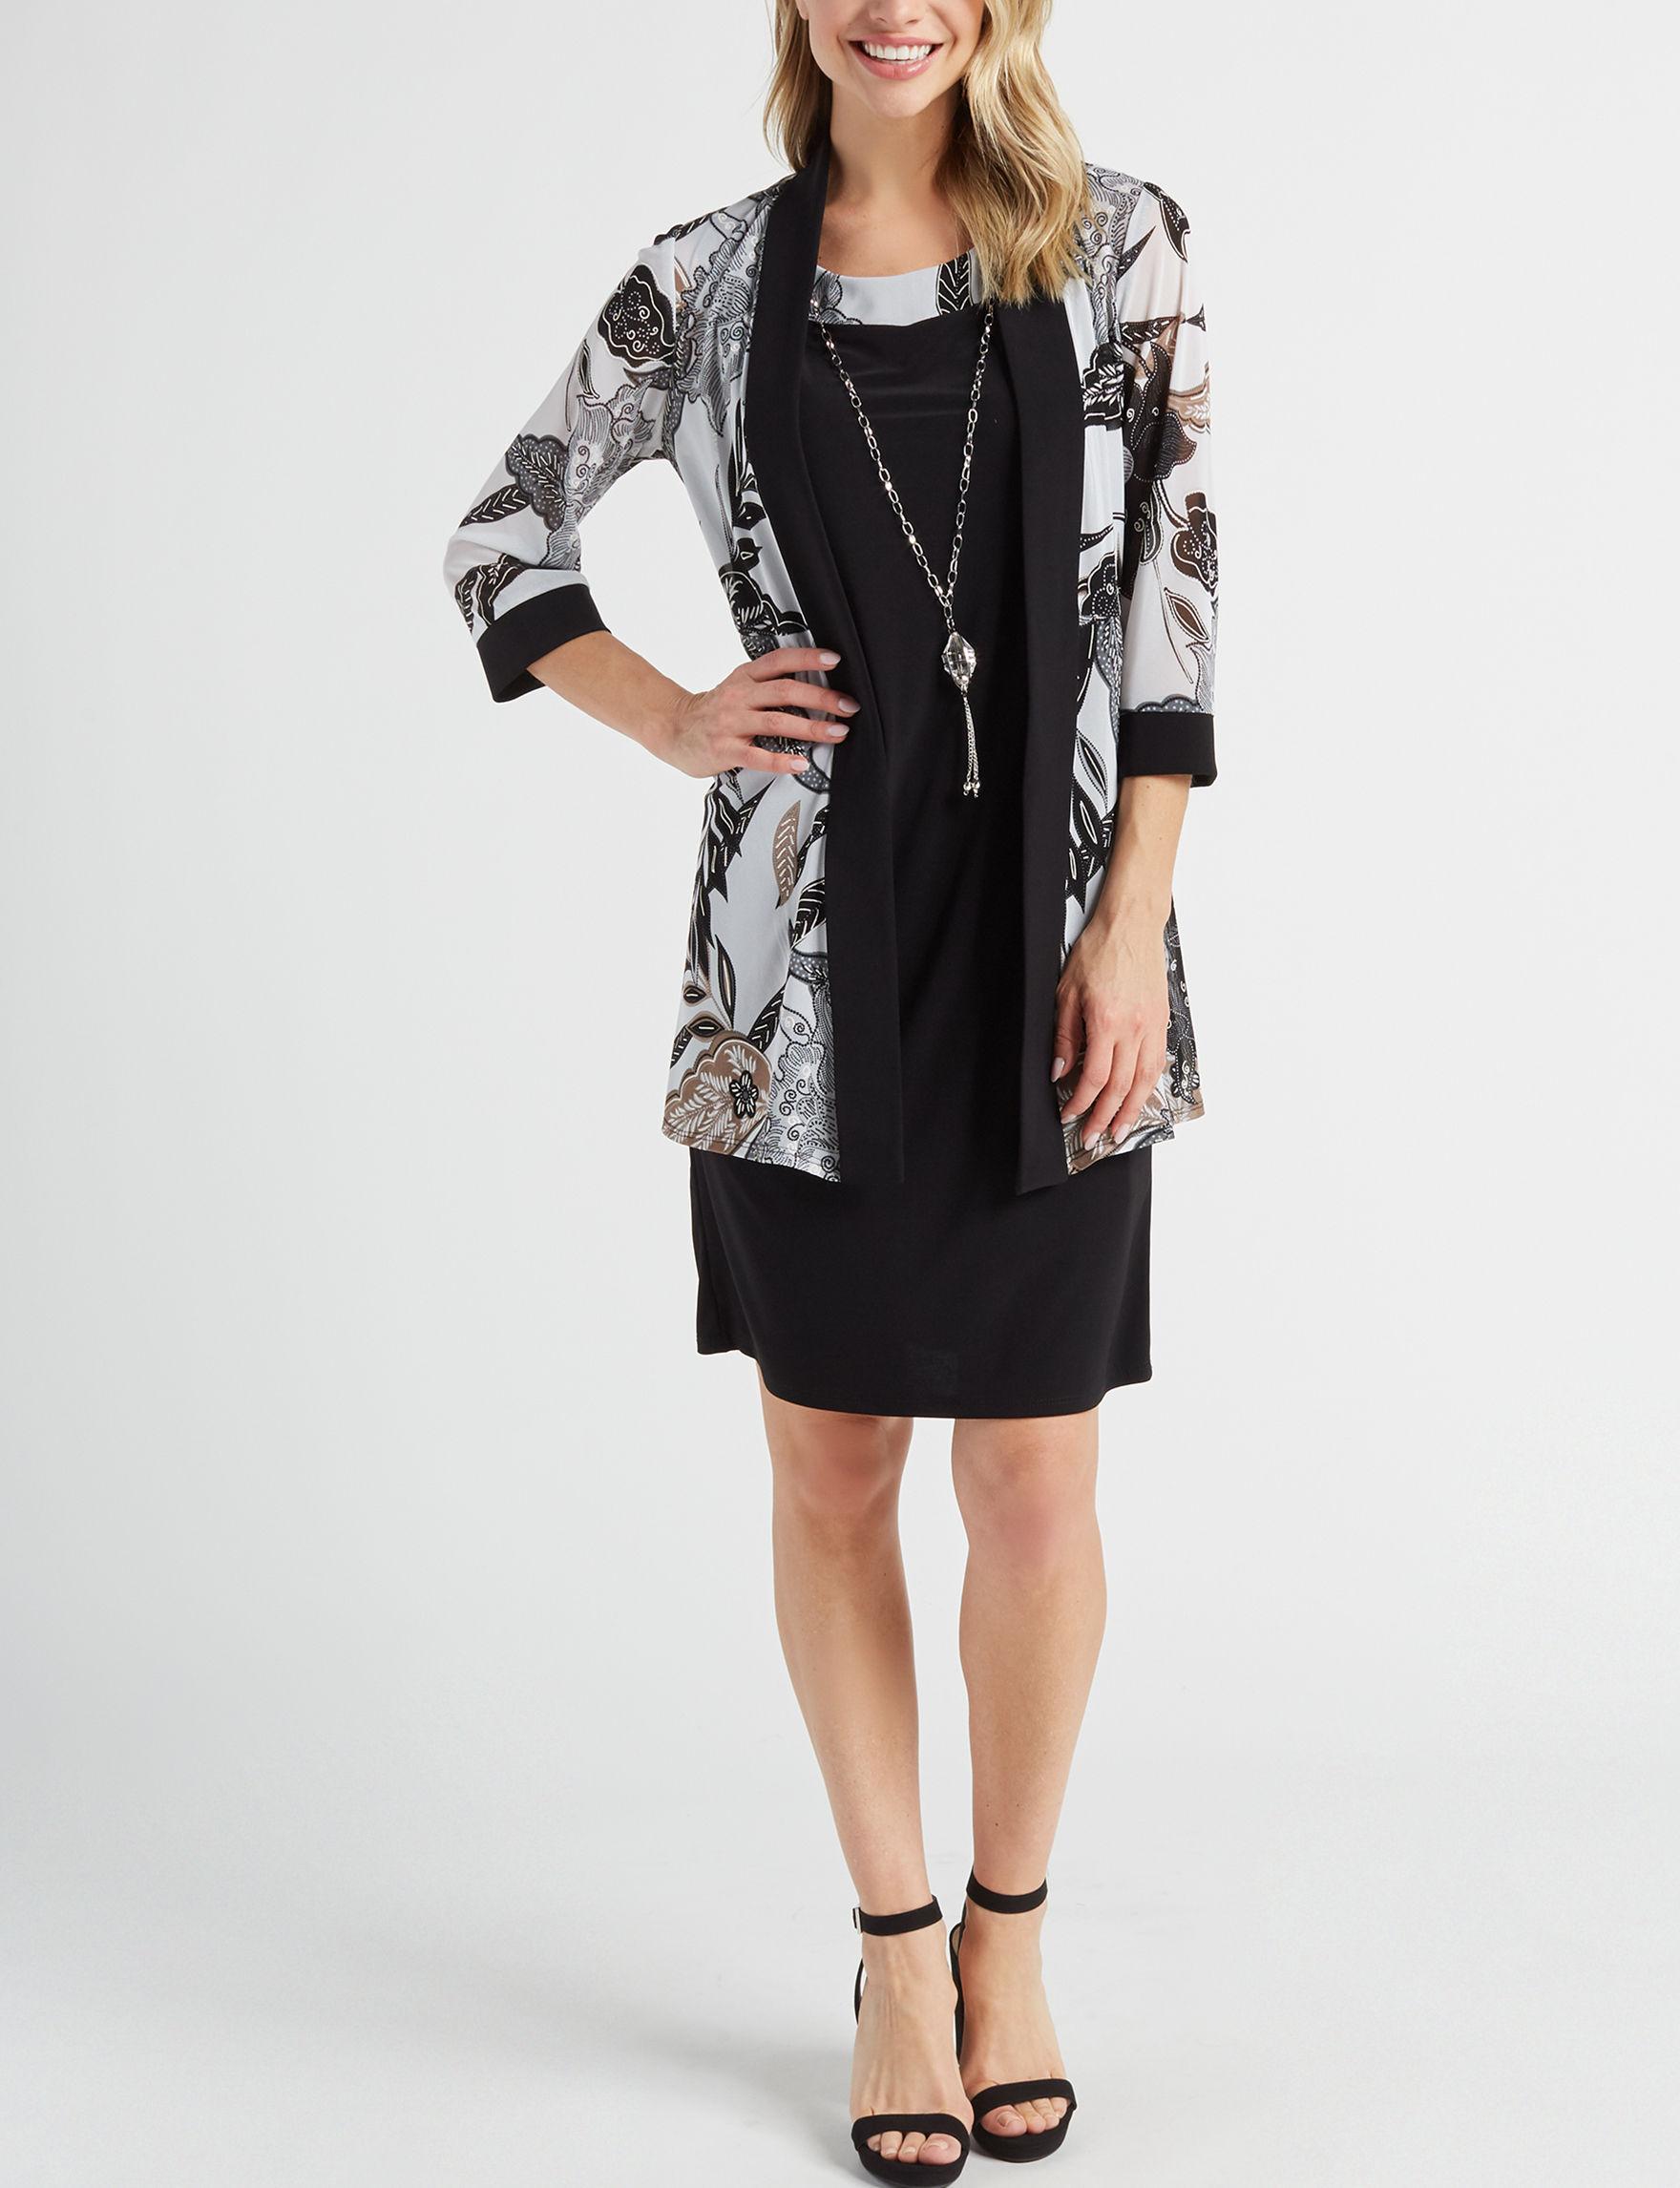 R & M Richards Navy Everyday & Casual Jacket Dresses